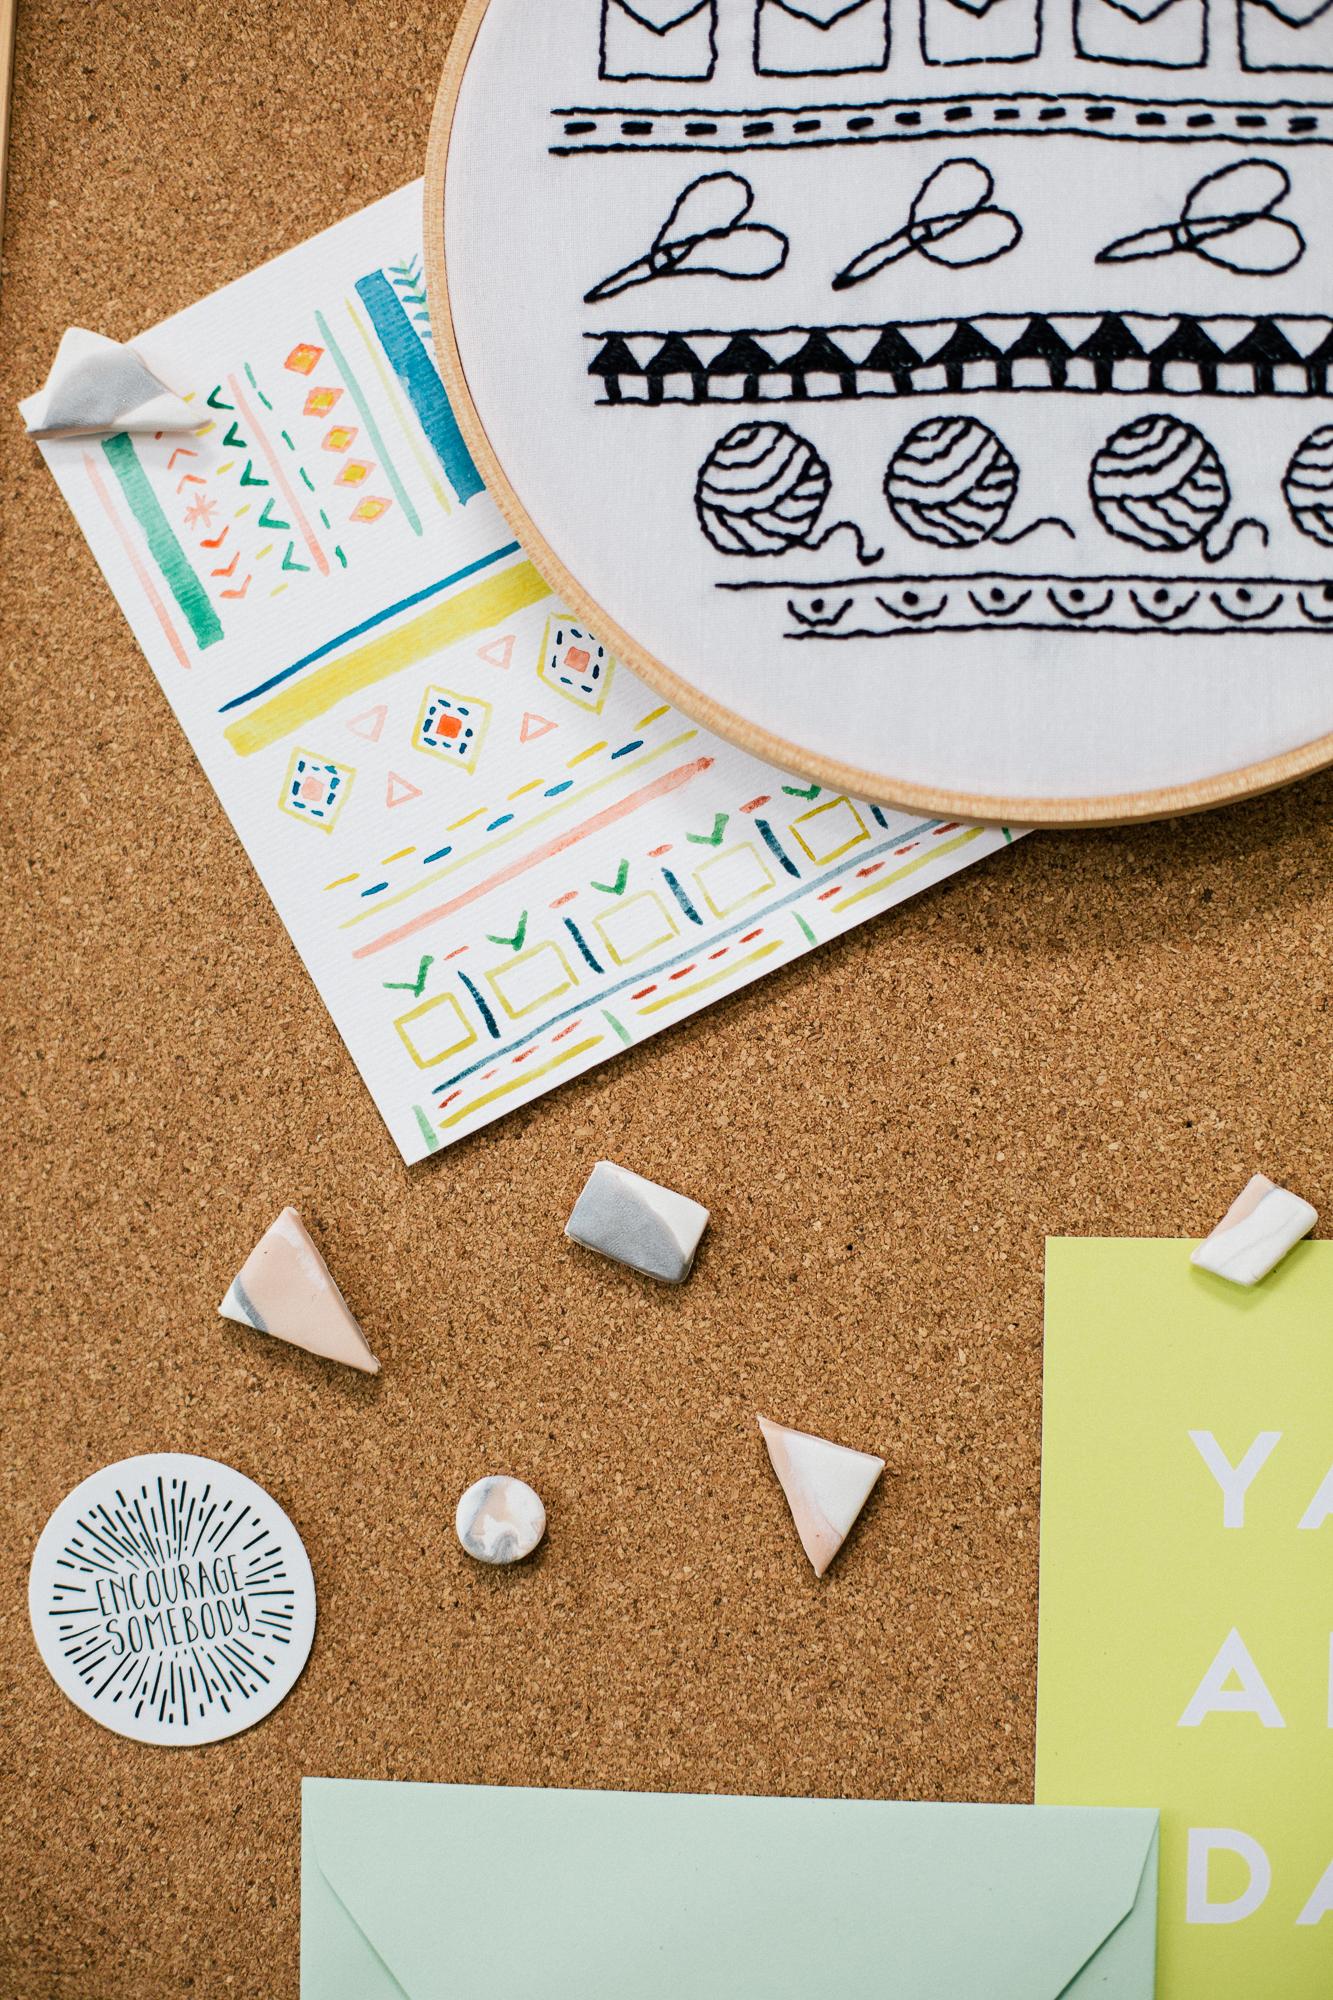 Paper Craft Pantry DIY Thumb Tacks